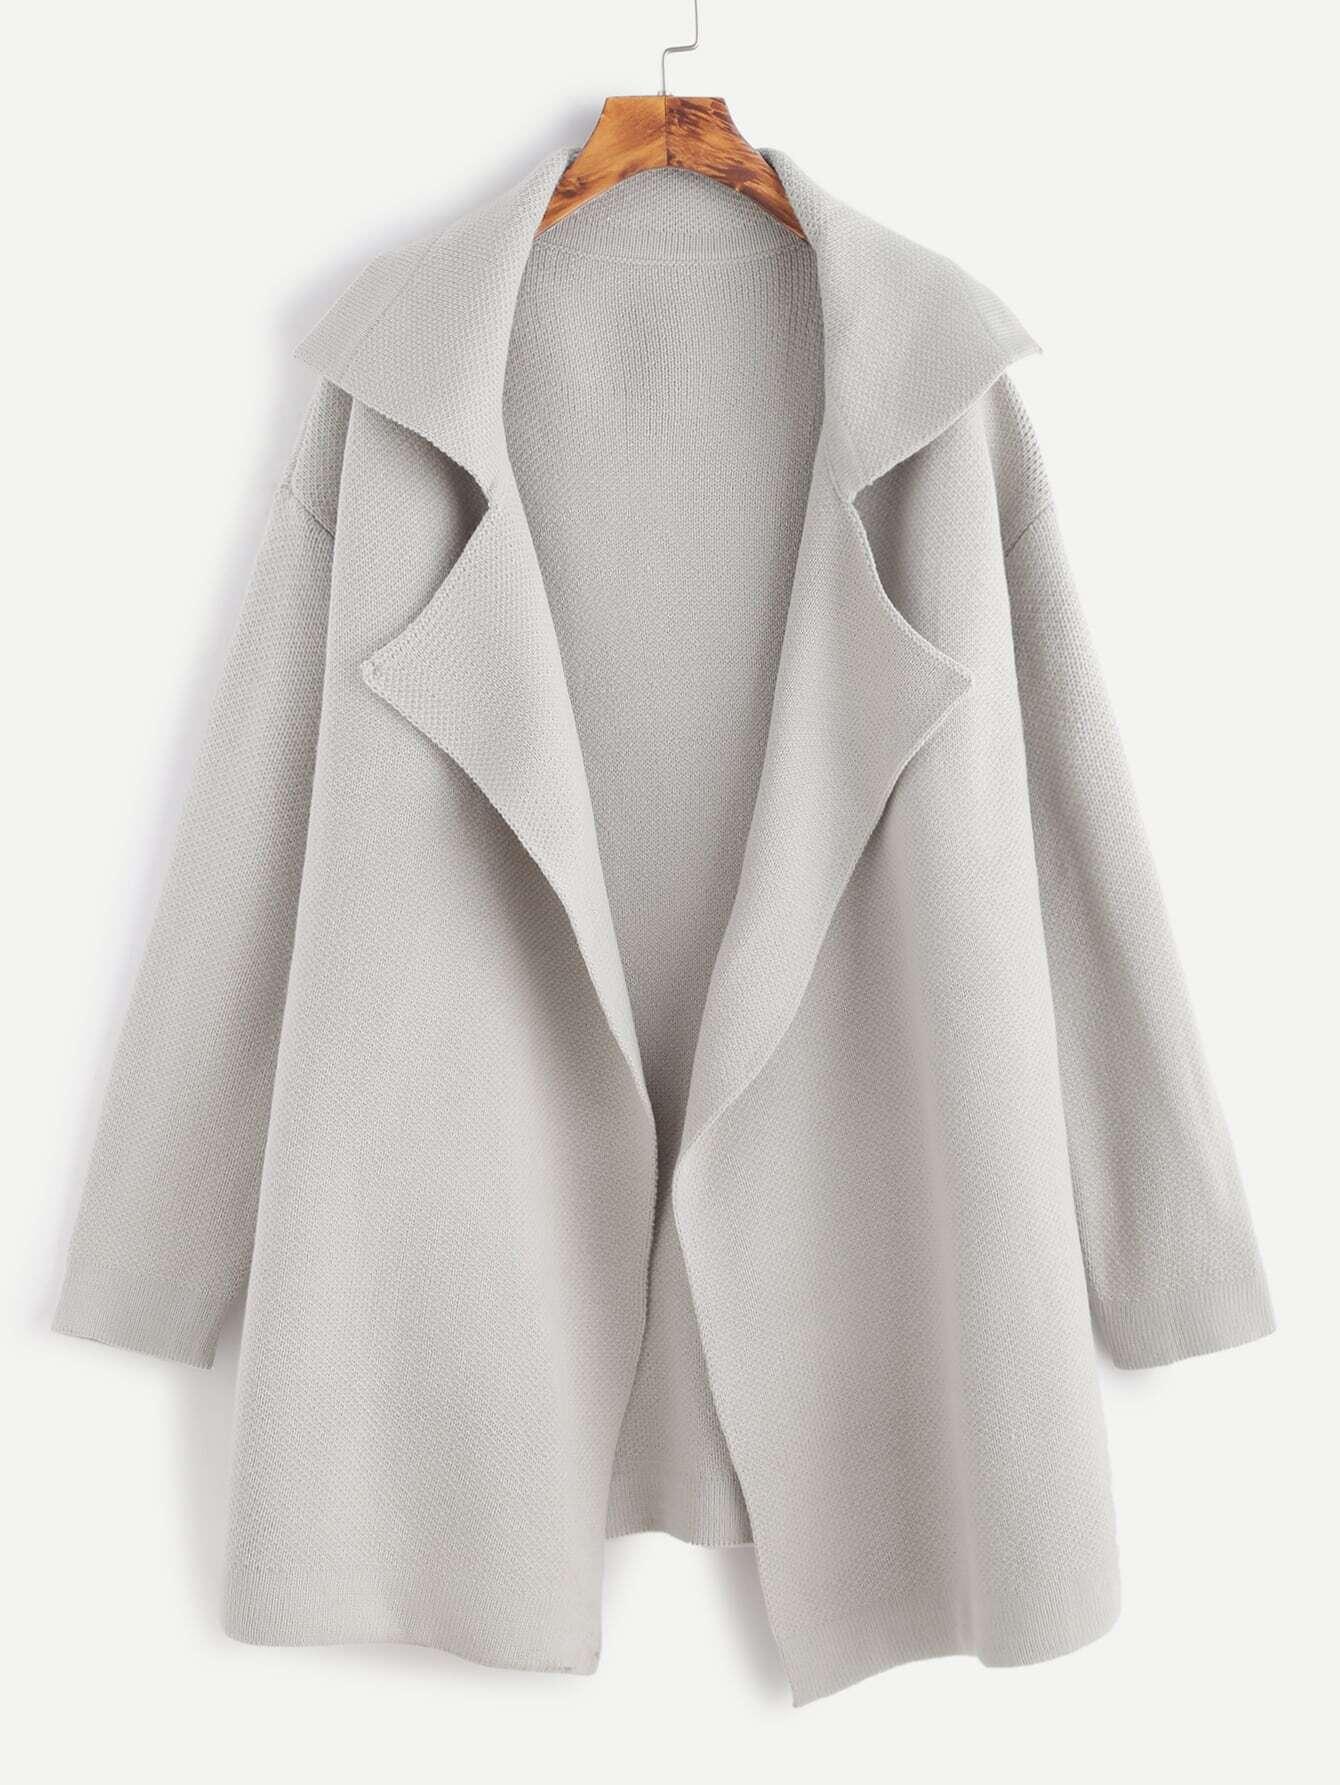 Grey Notch Collar Drop Shoulder Sweater Coat sweater160926456